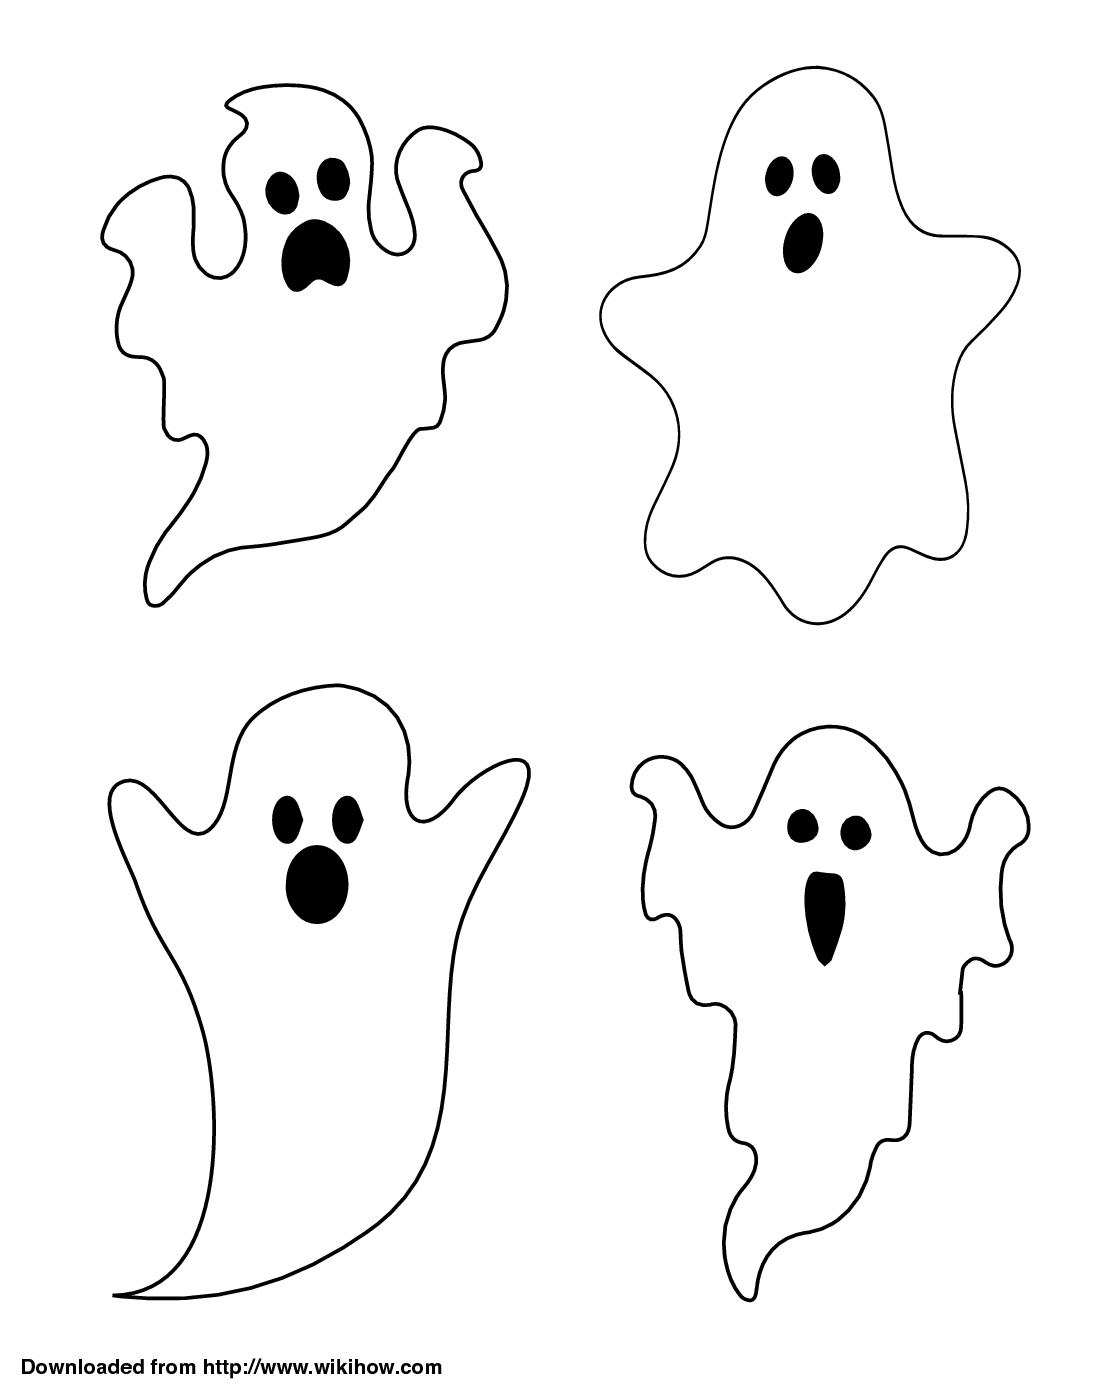 Printable Ghosts